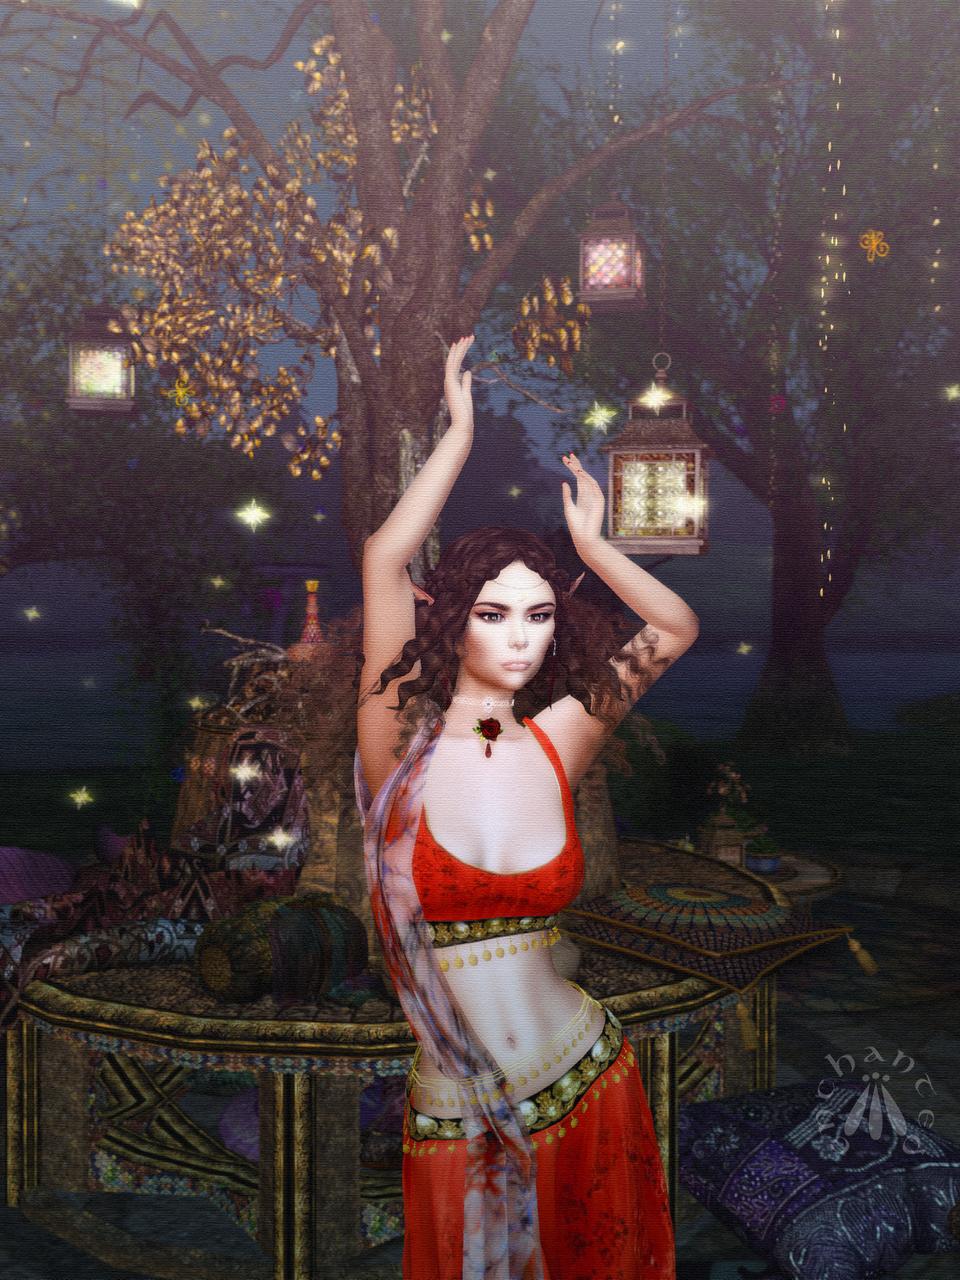 Dancing under the lantern tree BLOG - 2